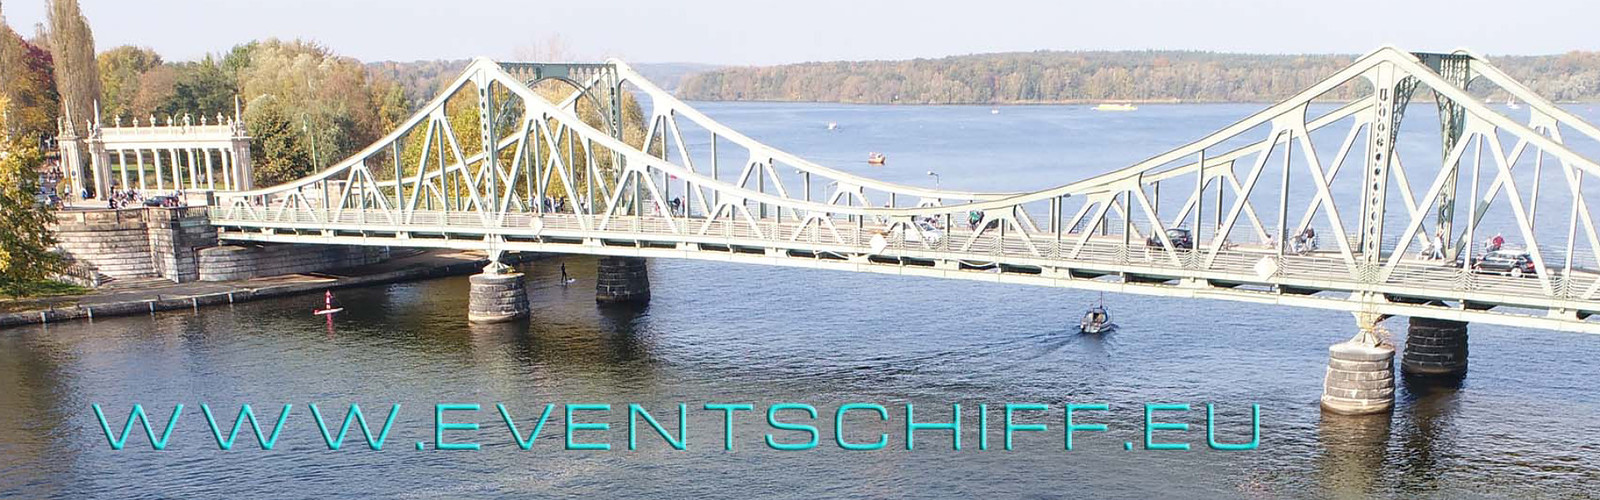 Glienicker Brücke (c) AHOI Yachting Winkler 2019